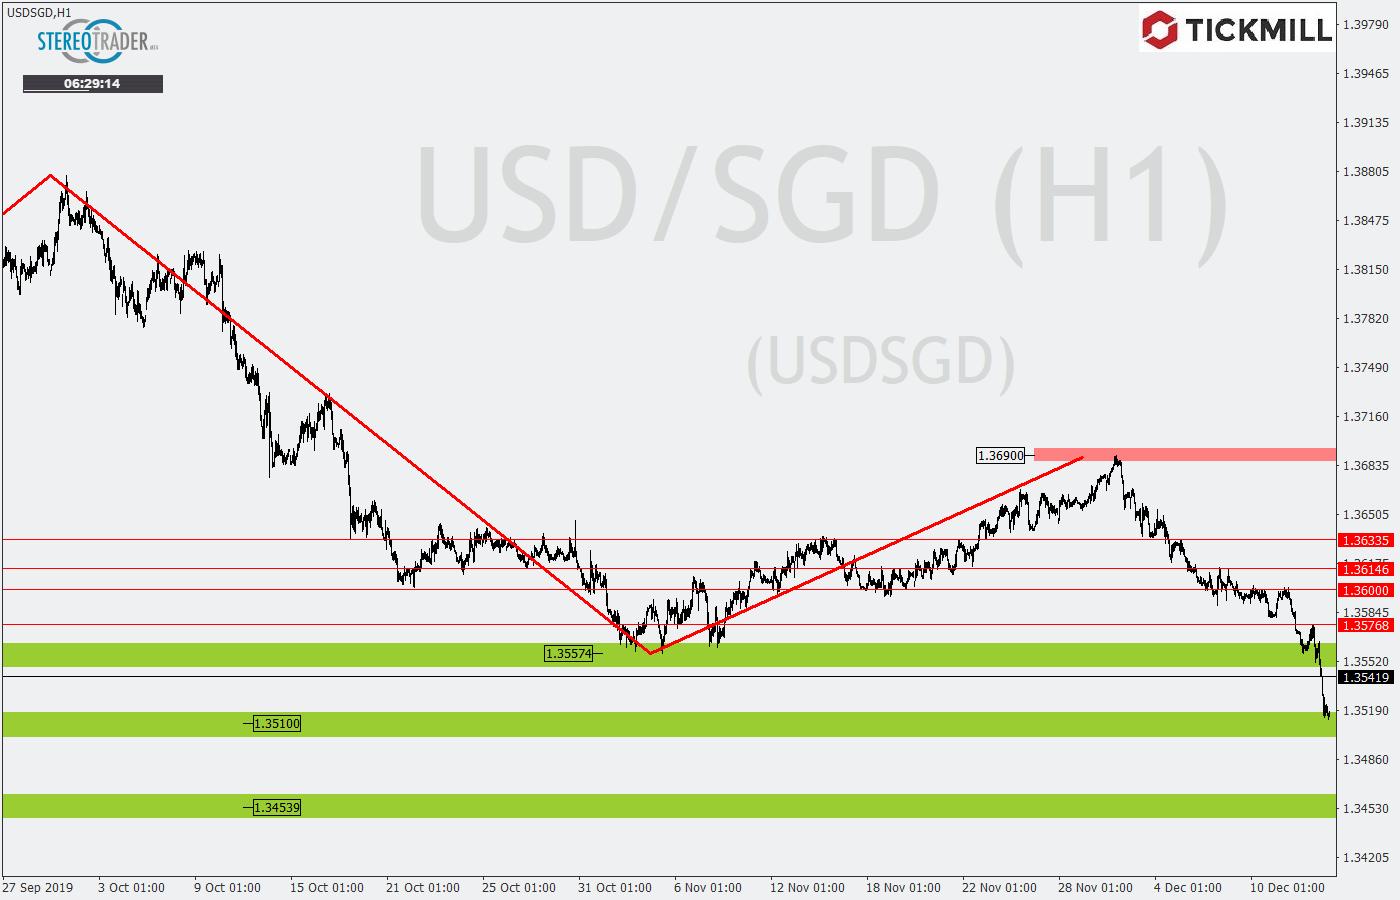 Tickmill-Analyse: USDSGD im Tageschart